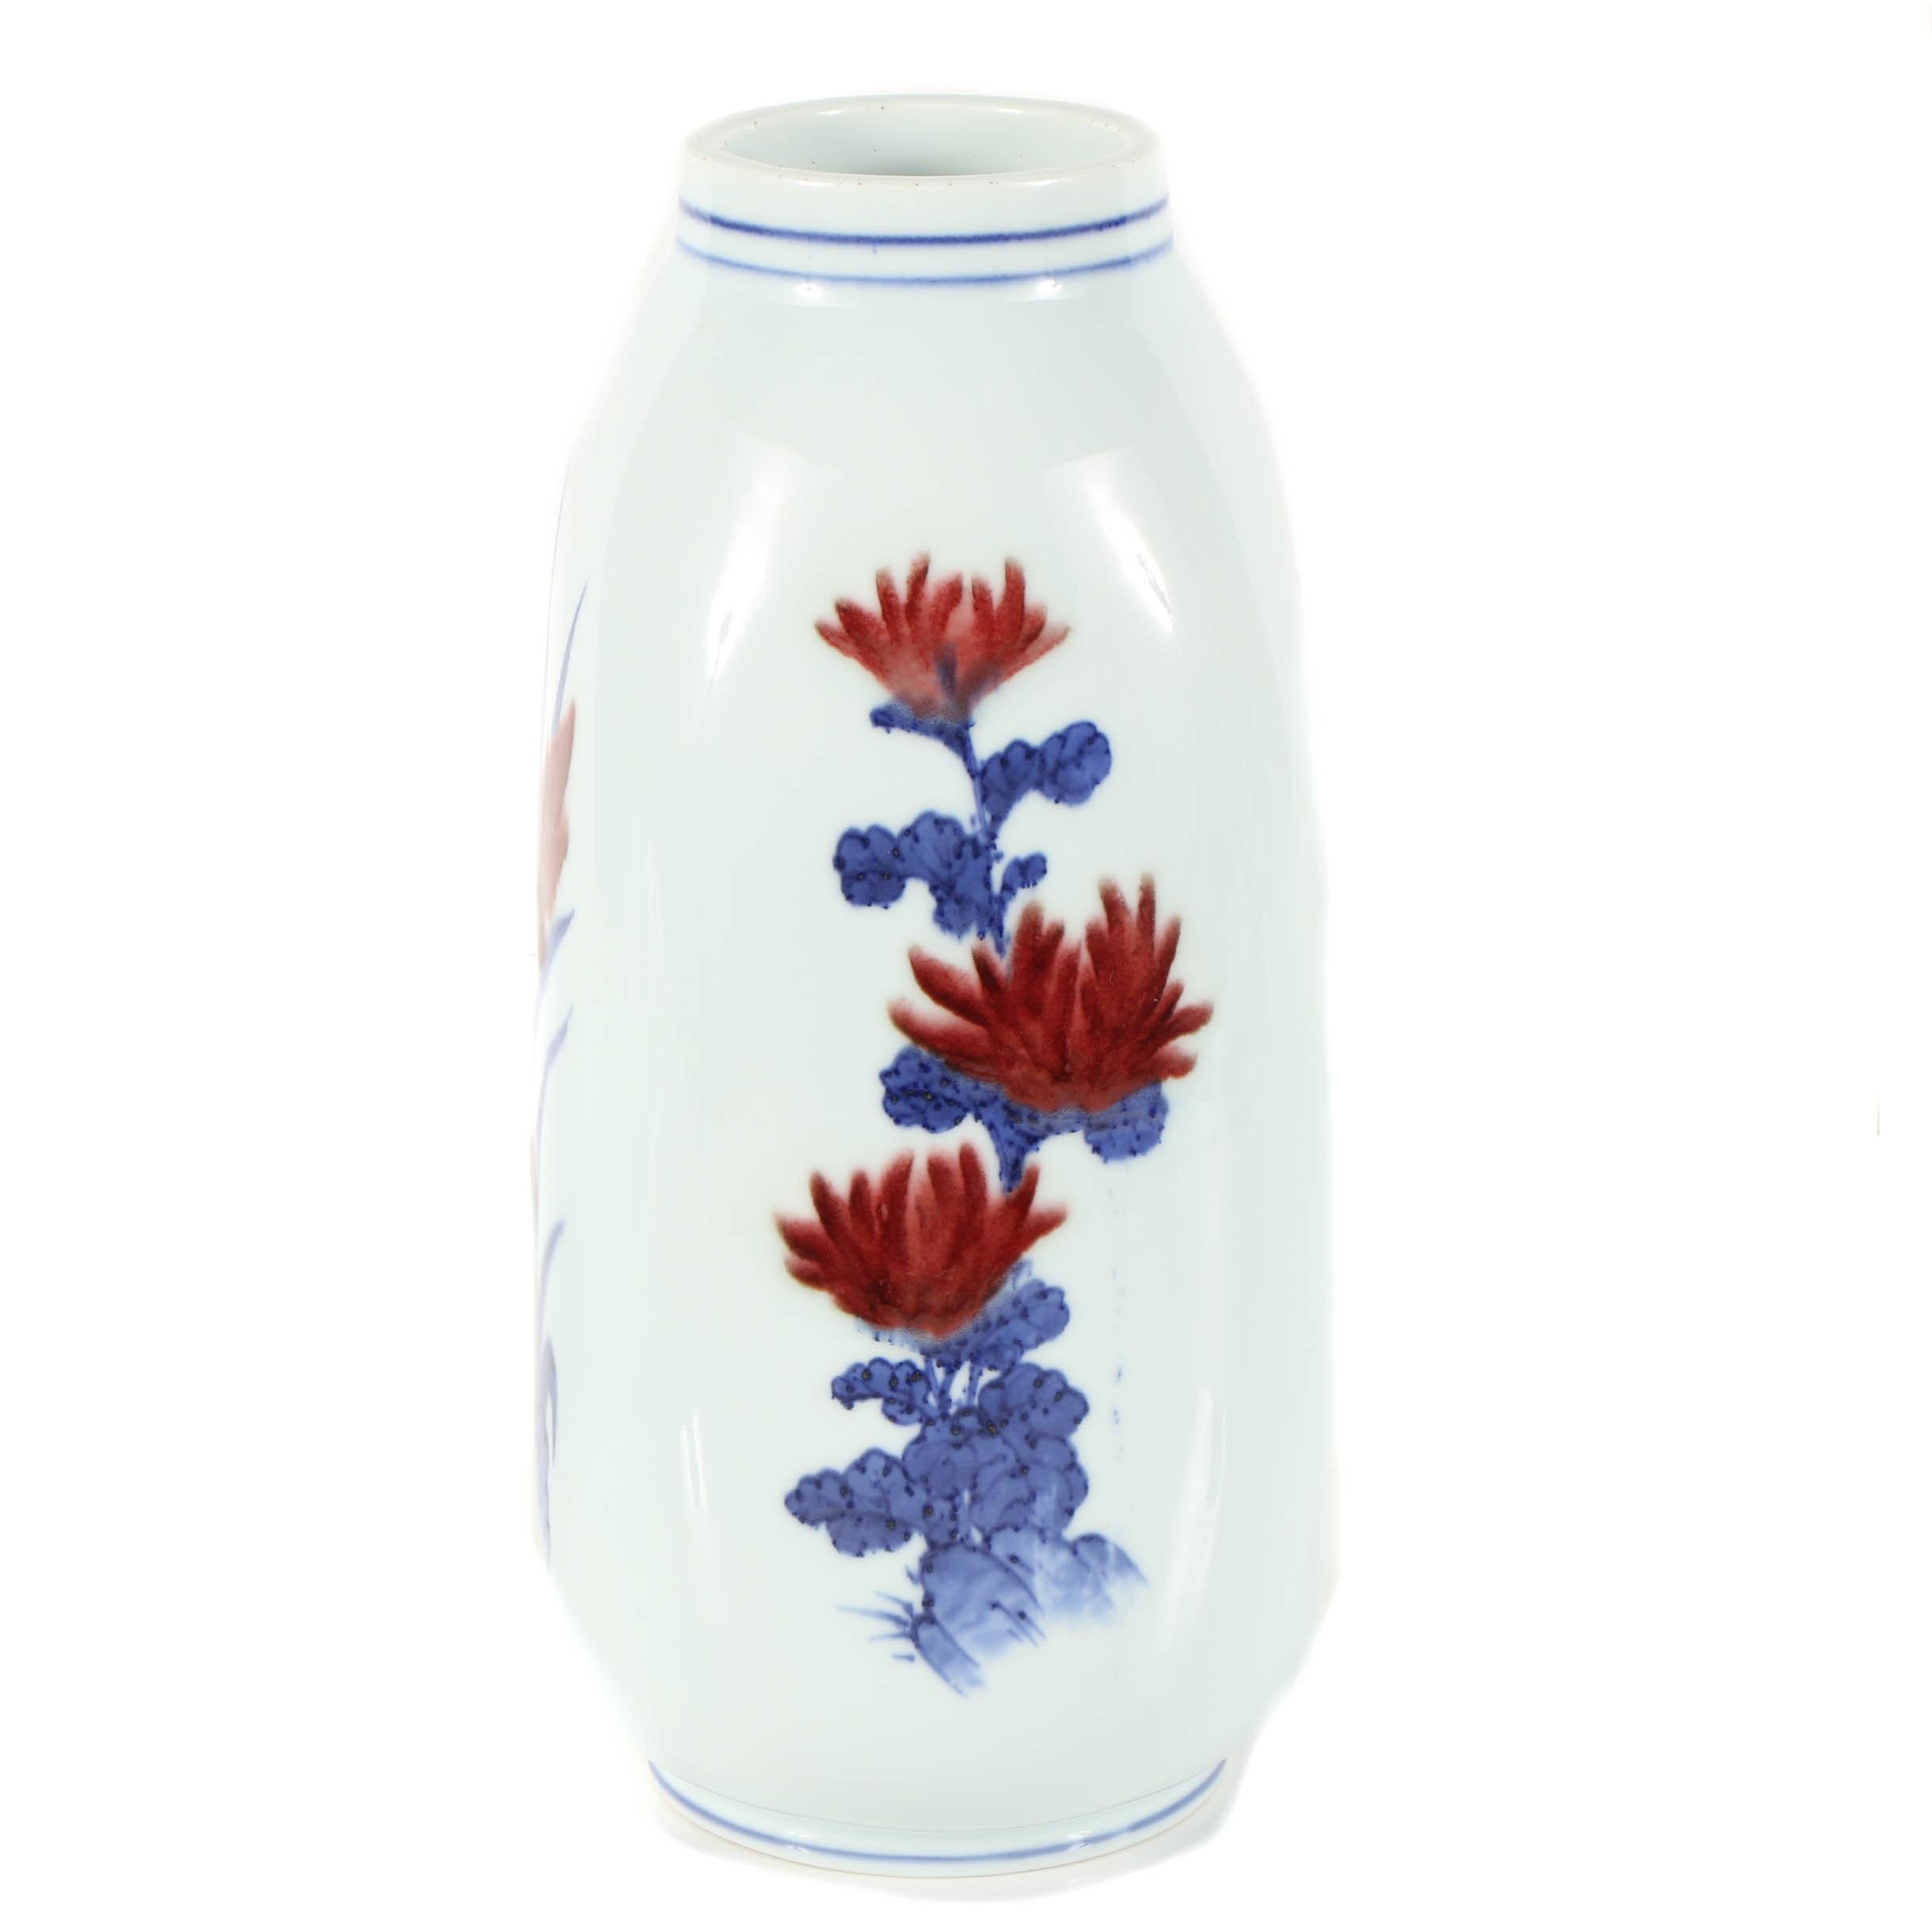 Japanese Square Porcelain Vase with Floral Motif